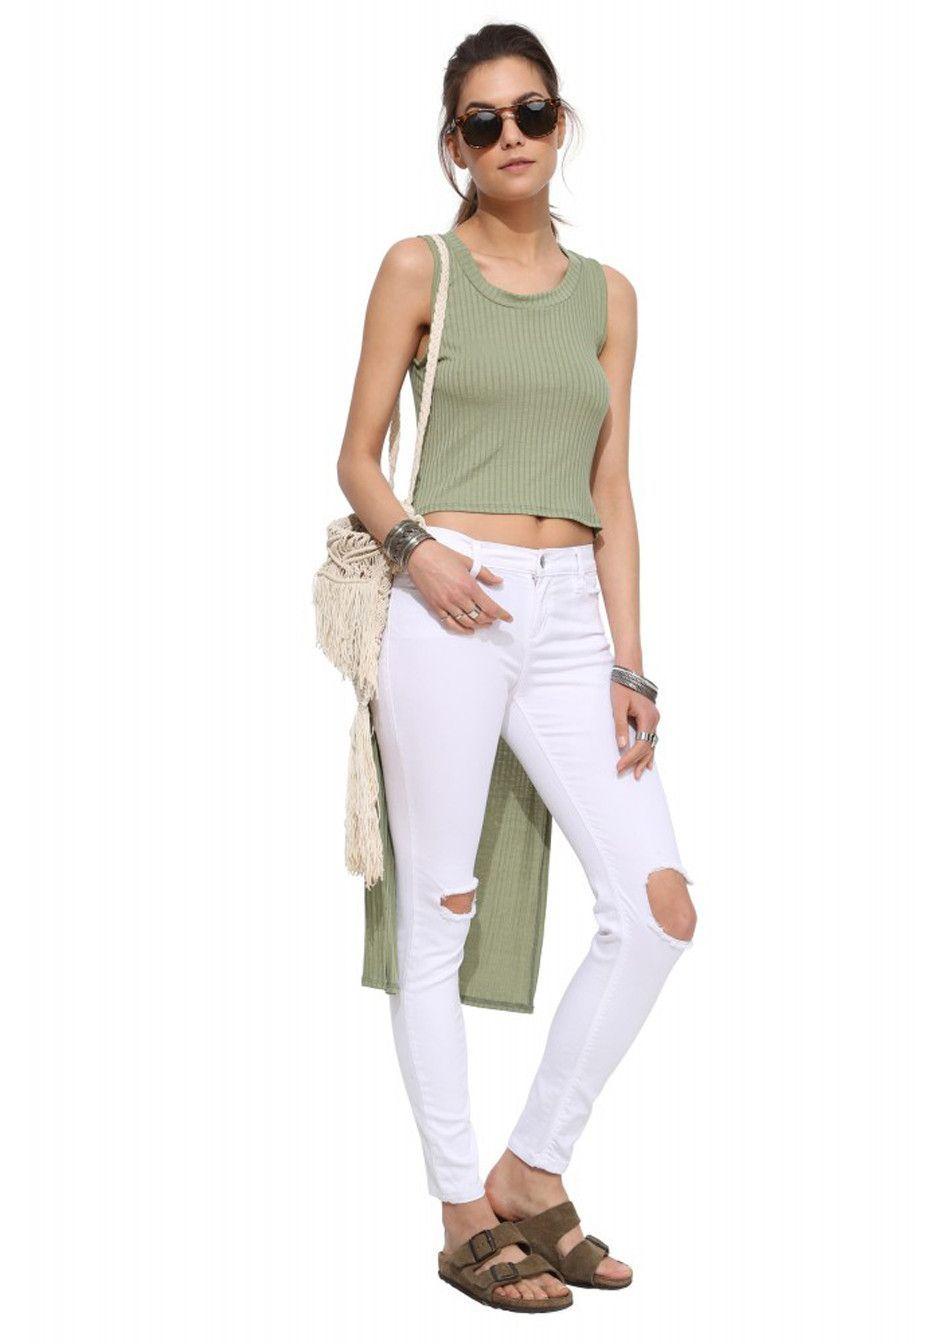 1175c6b0a New fashion women t shirt sexy top tee front short back long tops  sleeveless sexy lo shi t shirt tank casual vest ZT1046